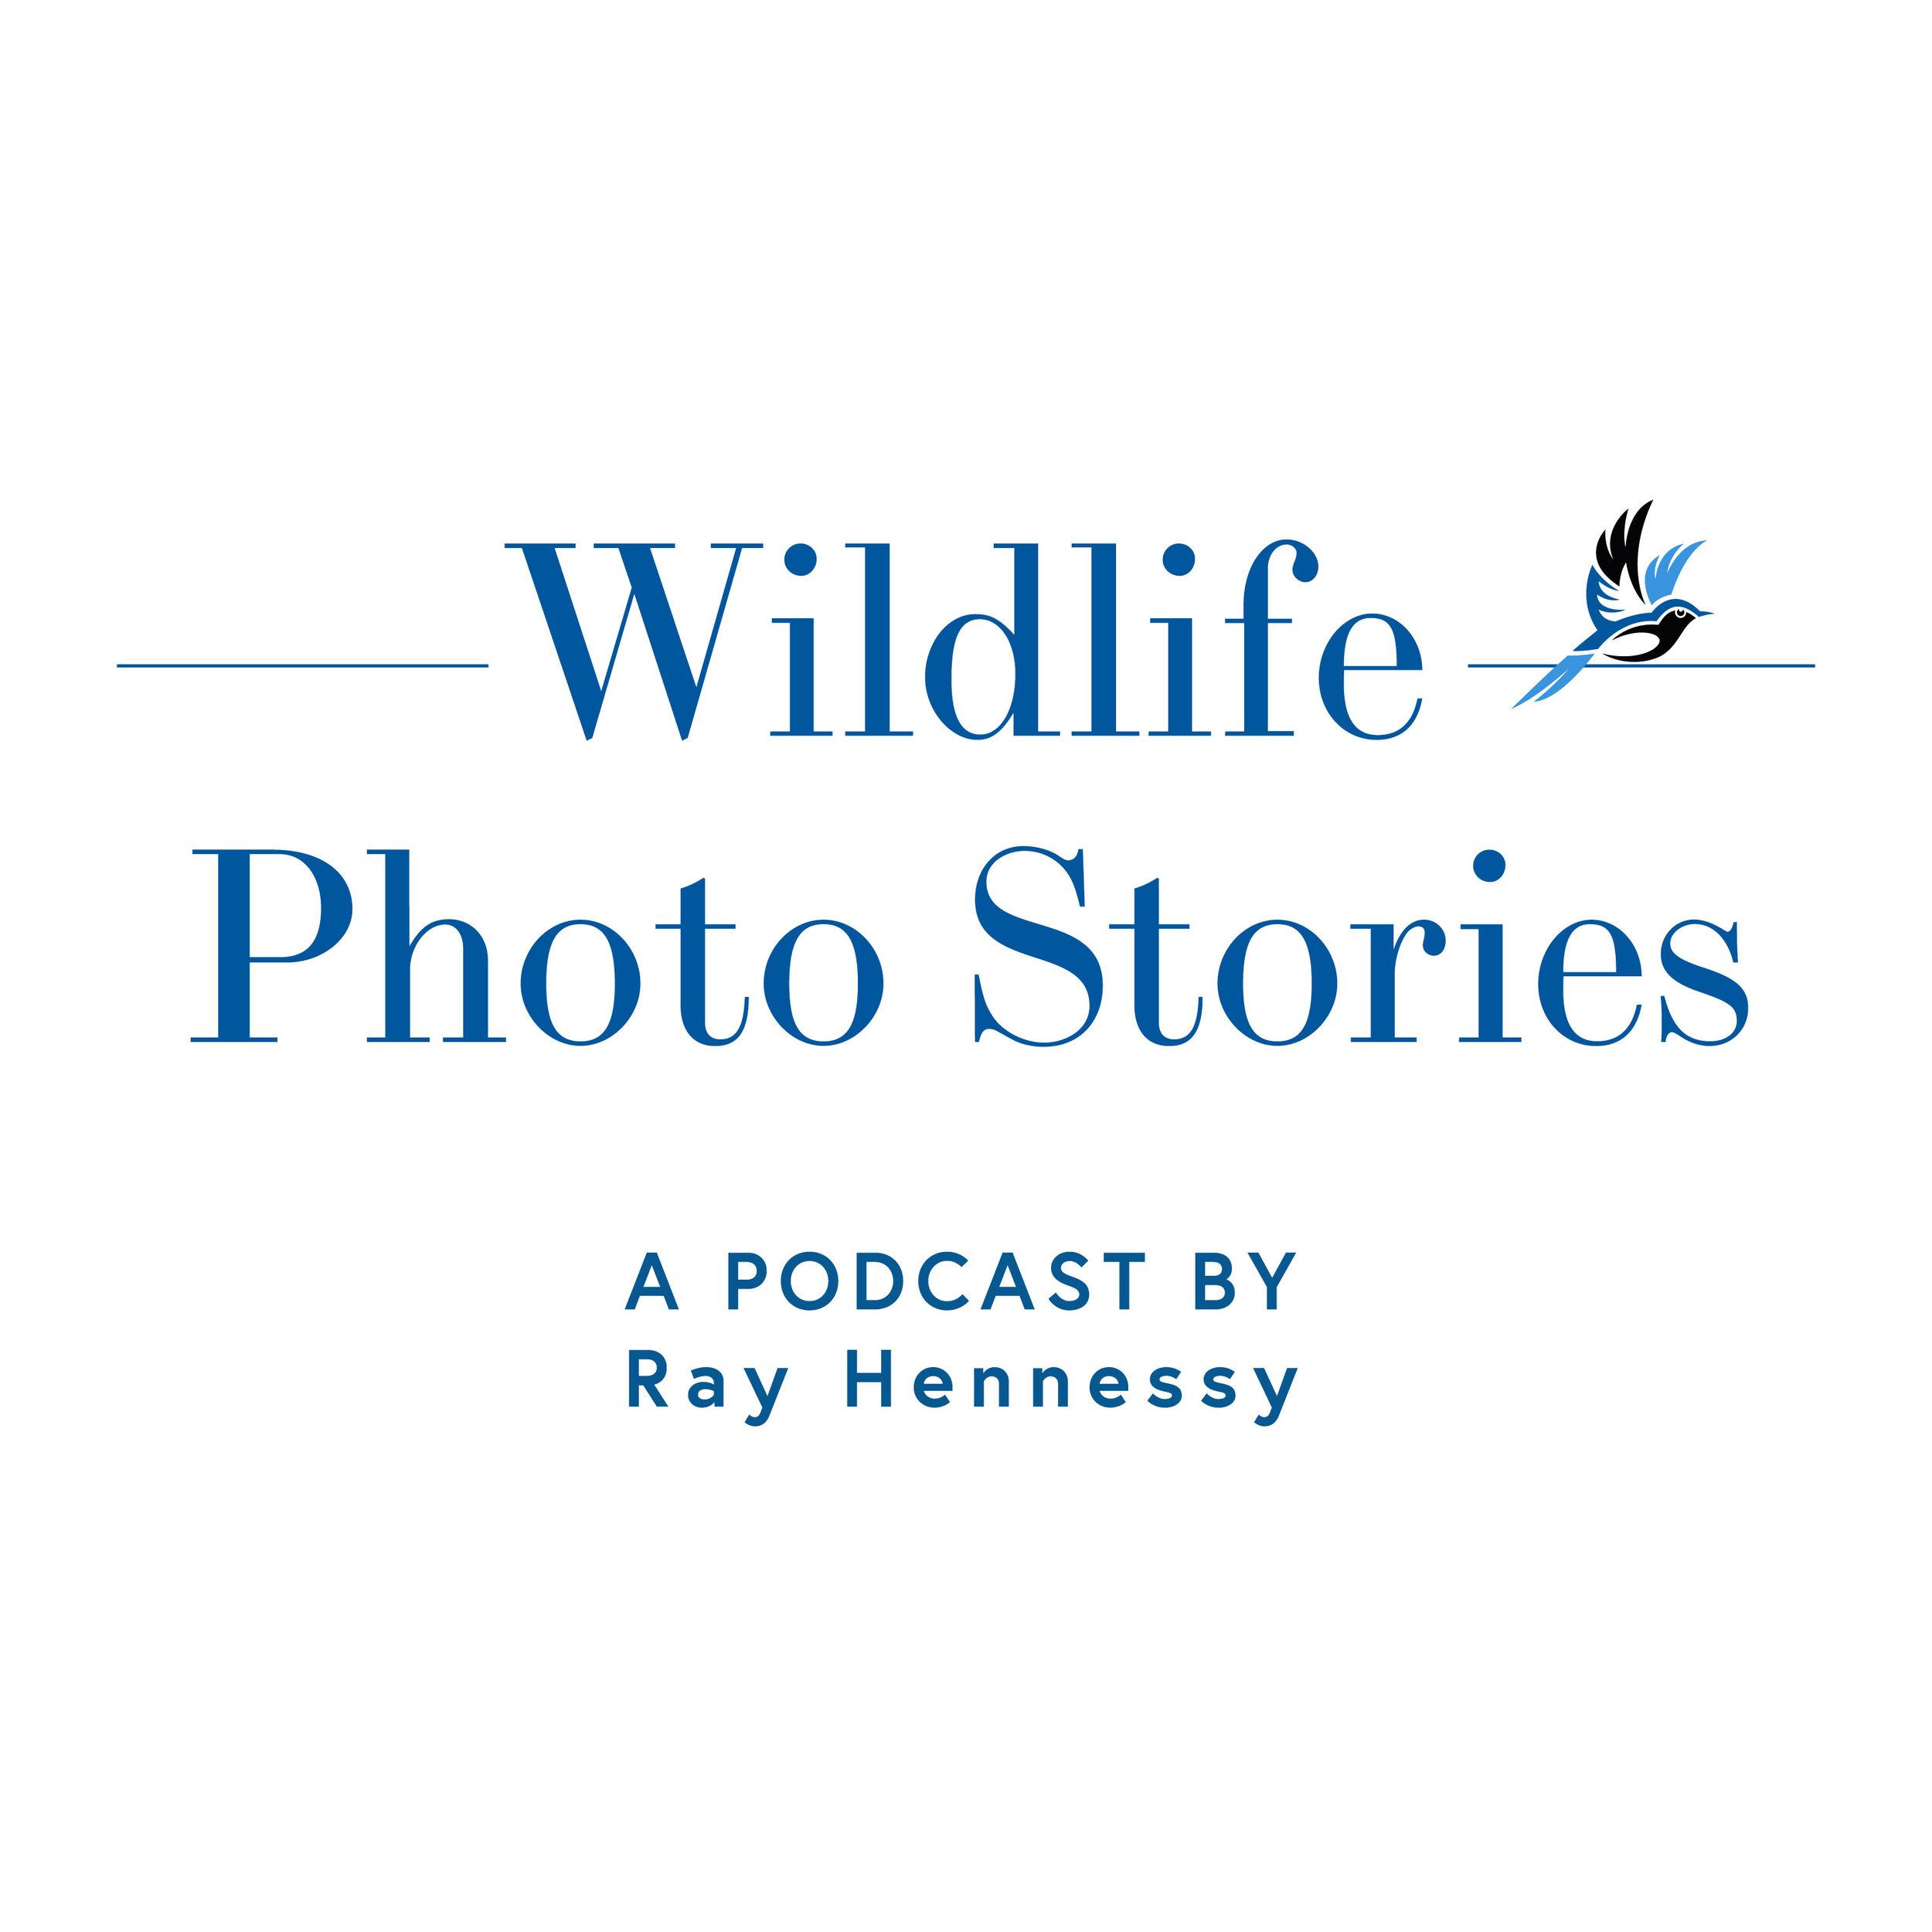 WIldlife-Photo-Stories-Cover.jpg